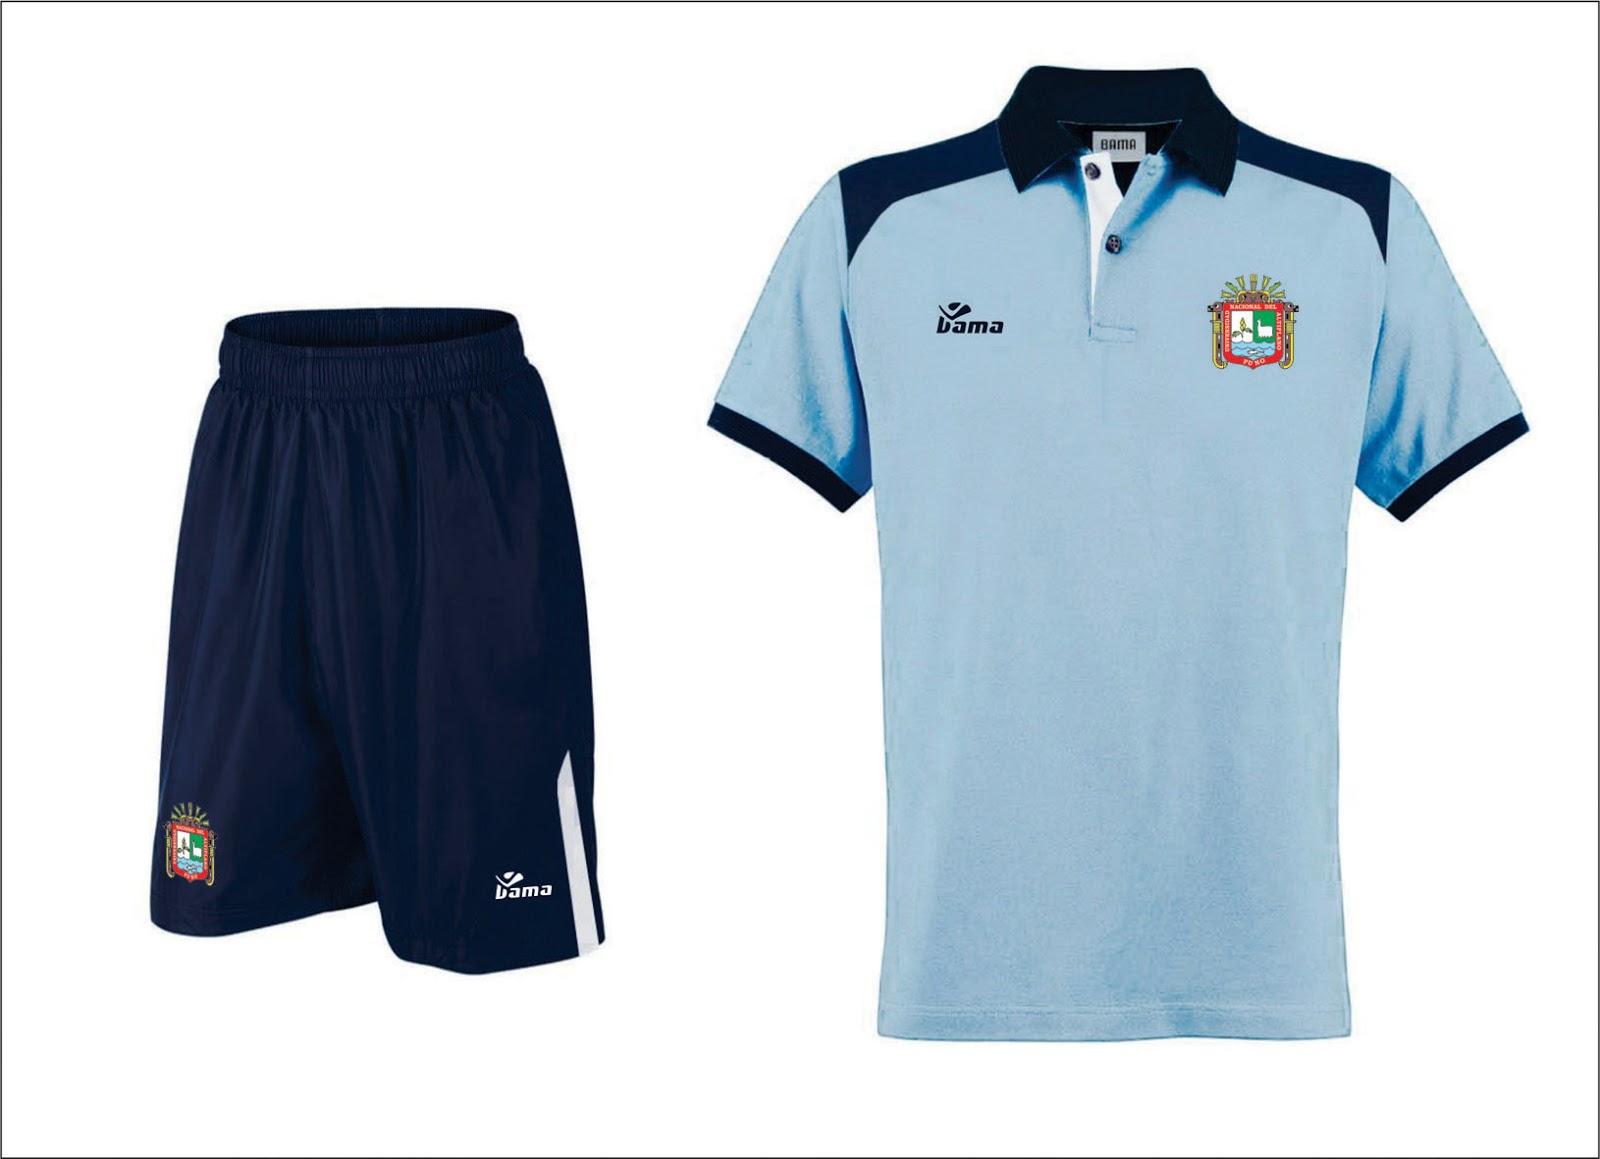 Camisa Polo Nike Barcelona No Mercado Livre Brasil d0062fa32a4